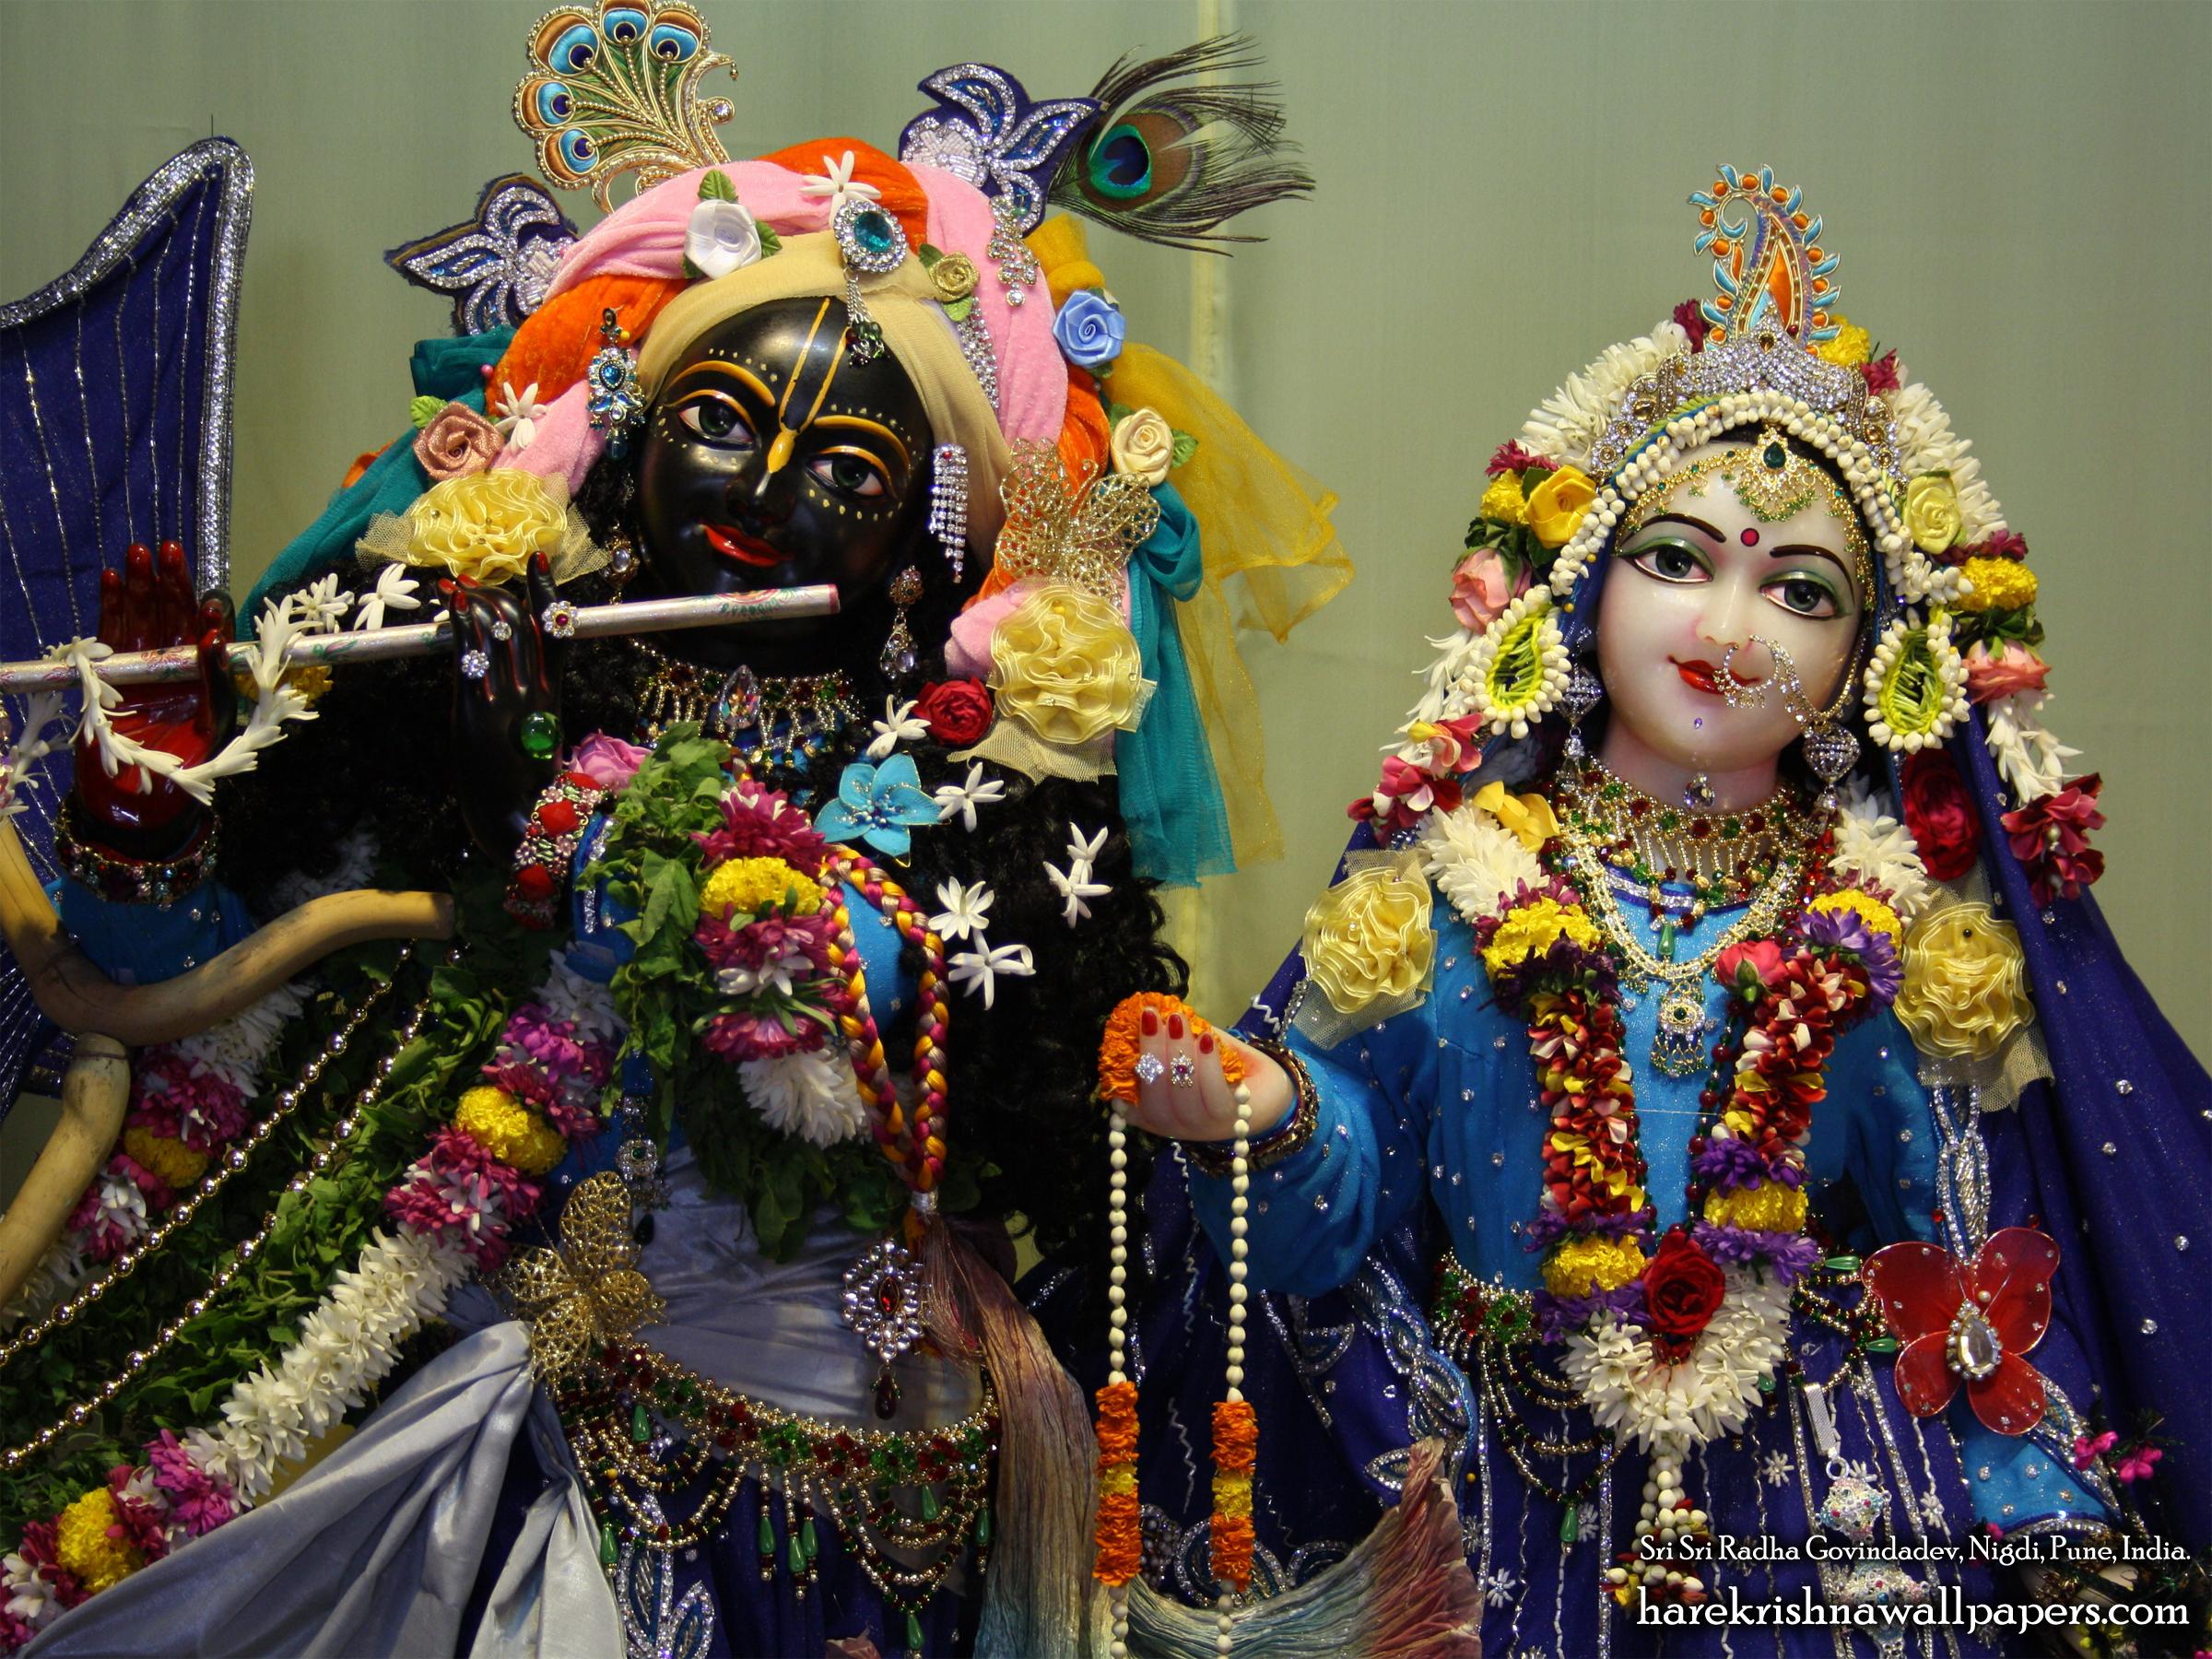 Sri Sri Radha Govind Close up Wallpaper (009) Size 2400x1800 Download